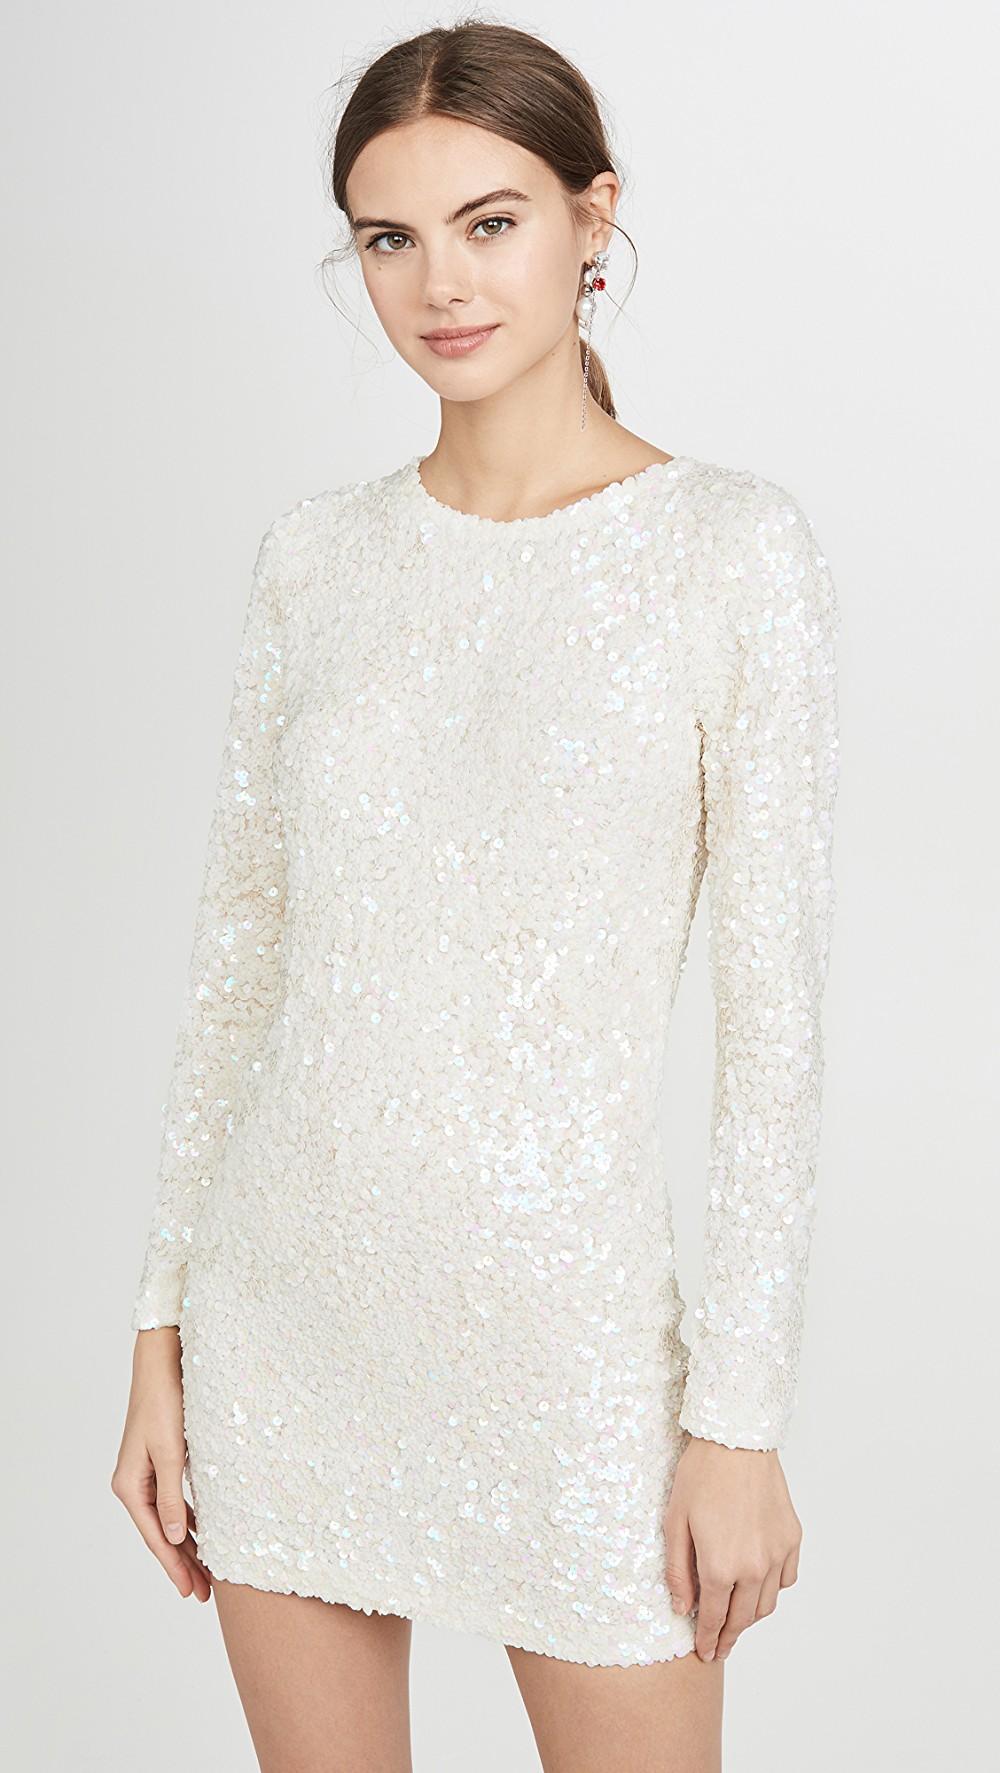 White Sequin Gown Wedding Dress Sequin White Sequin Dress Sequins Wedding Gown [ 2457 x 1535 Pixel ]